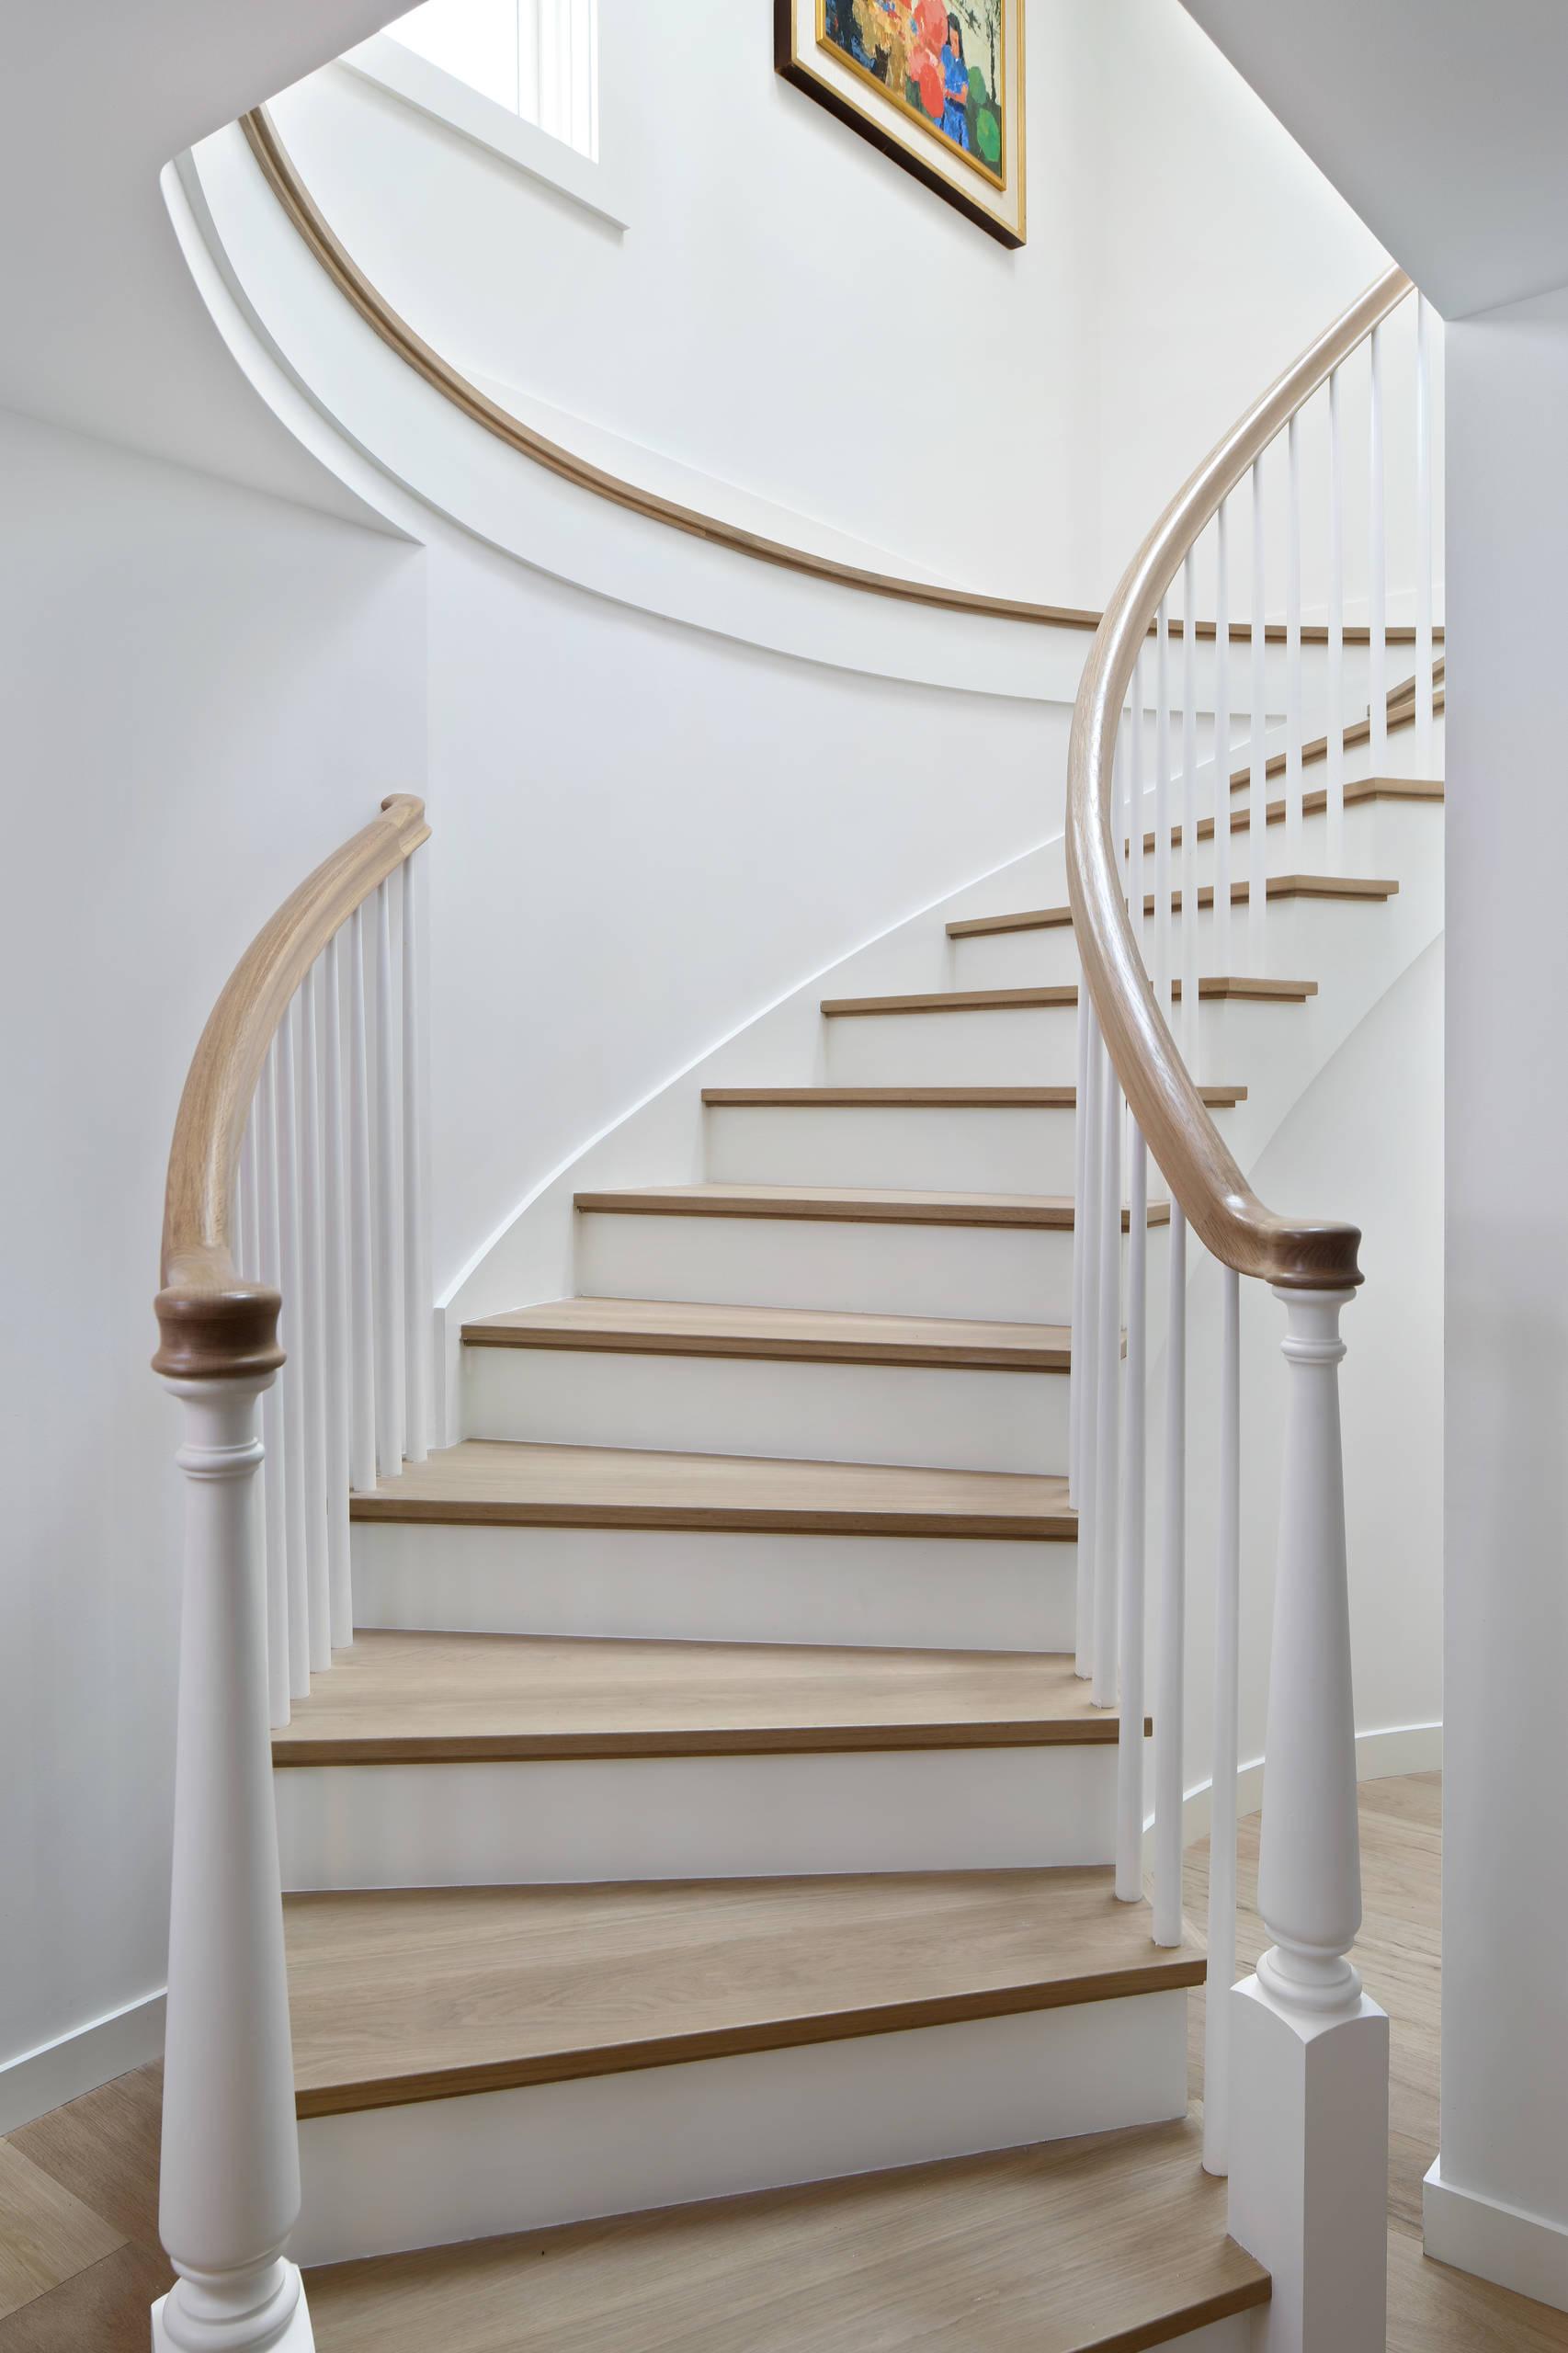 El Arroyo - curved staircase